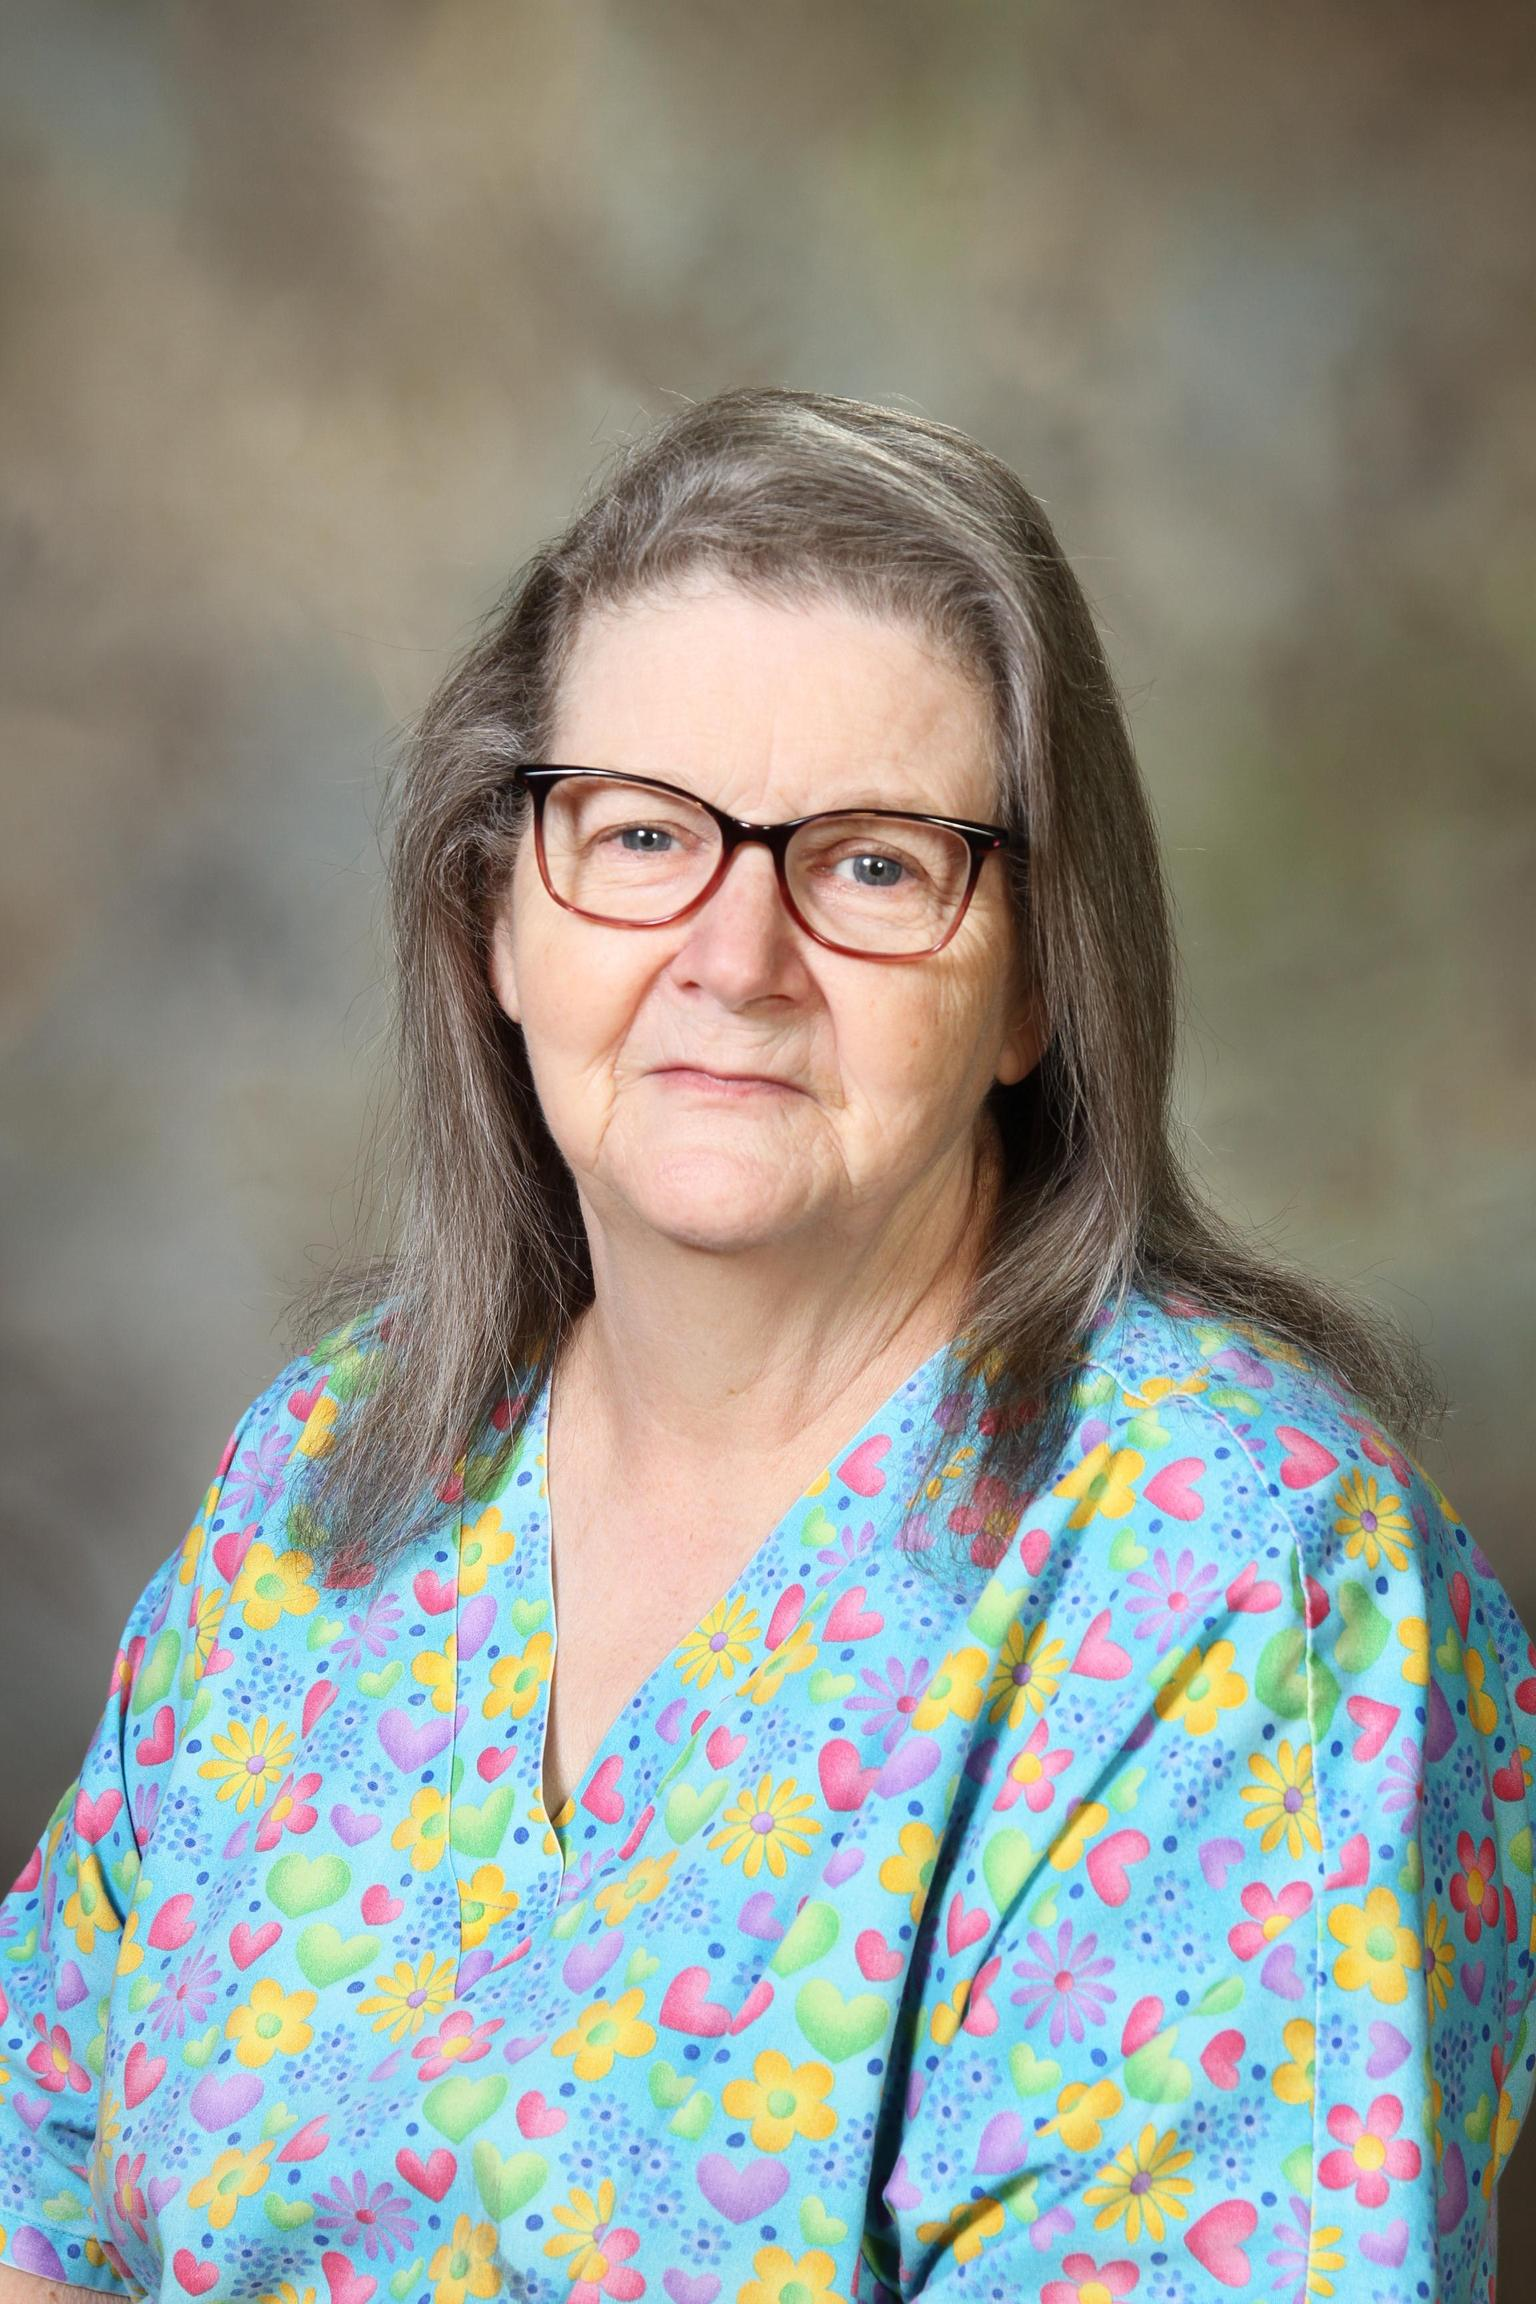 Ms. Connie Baskin